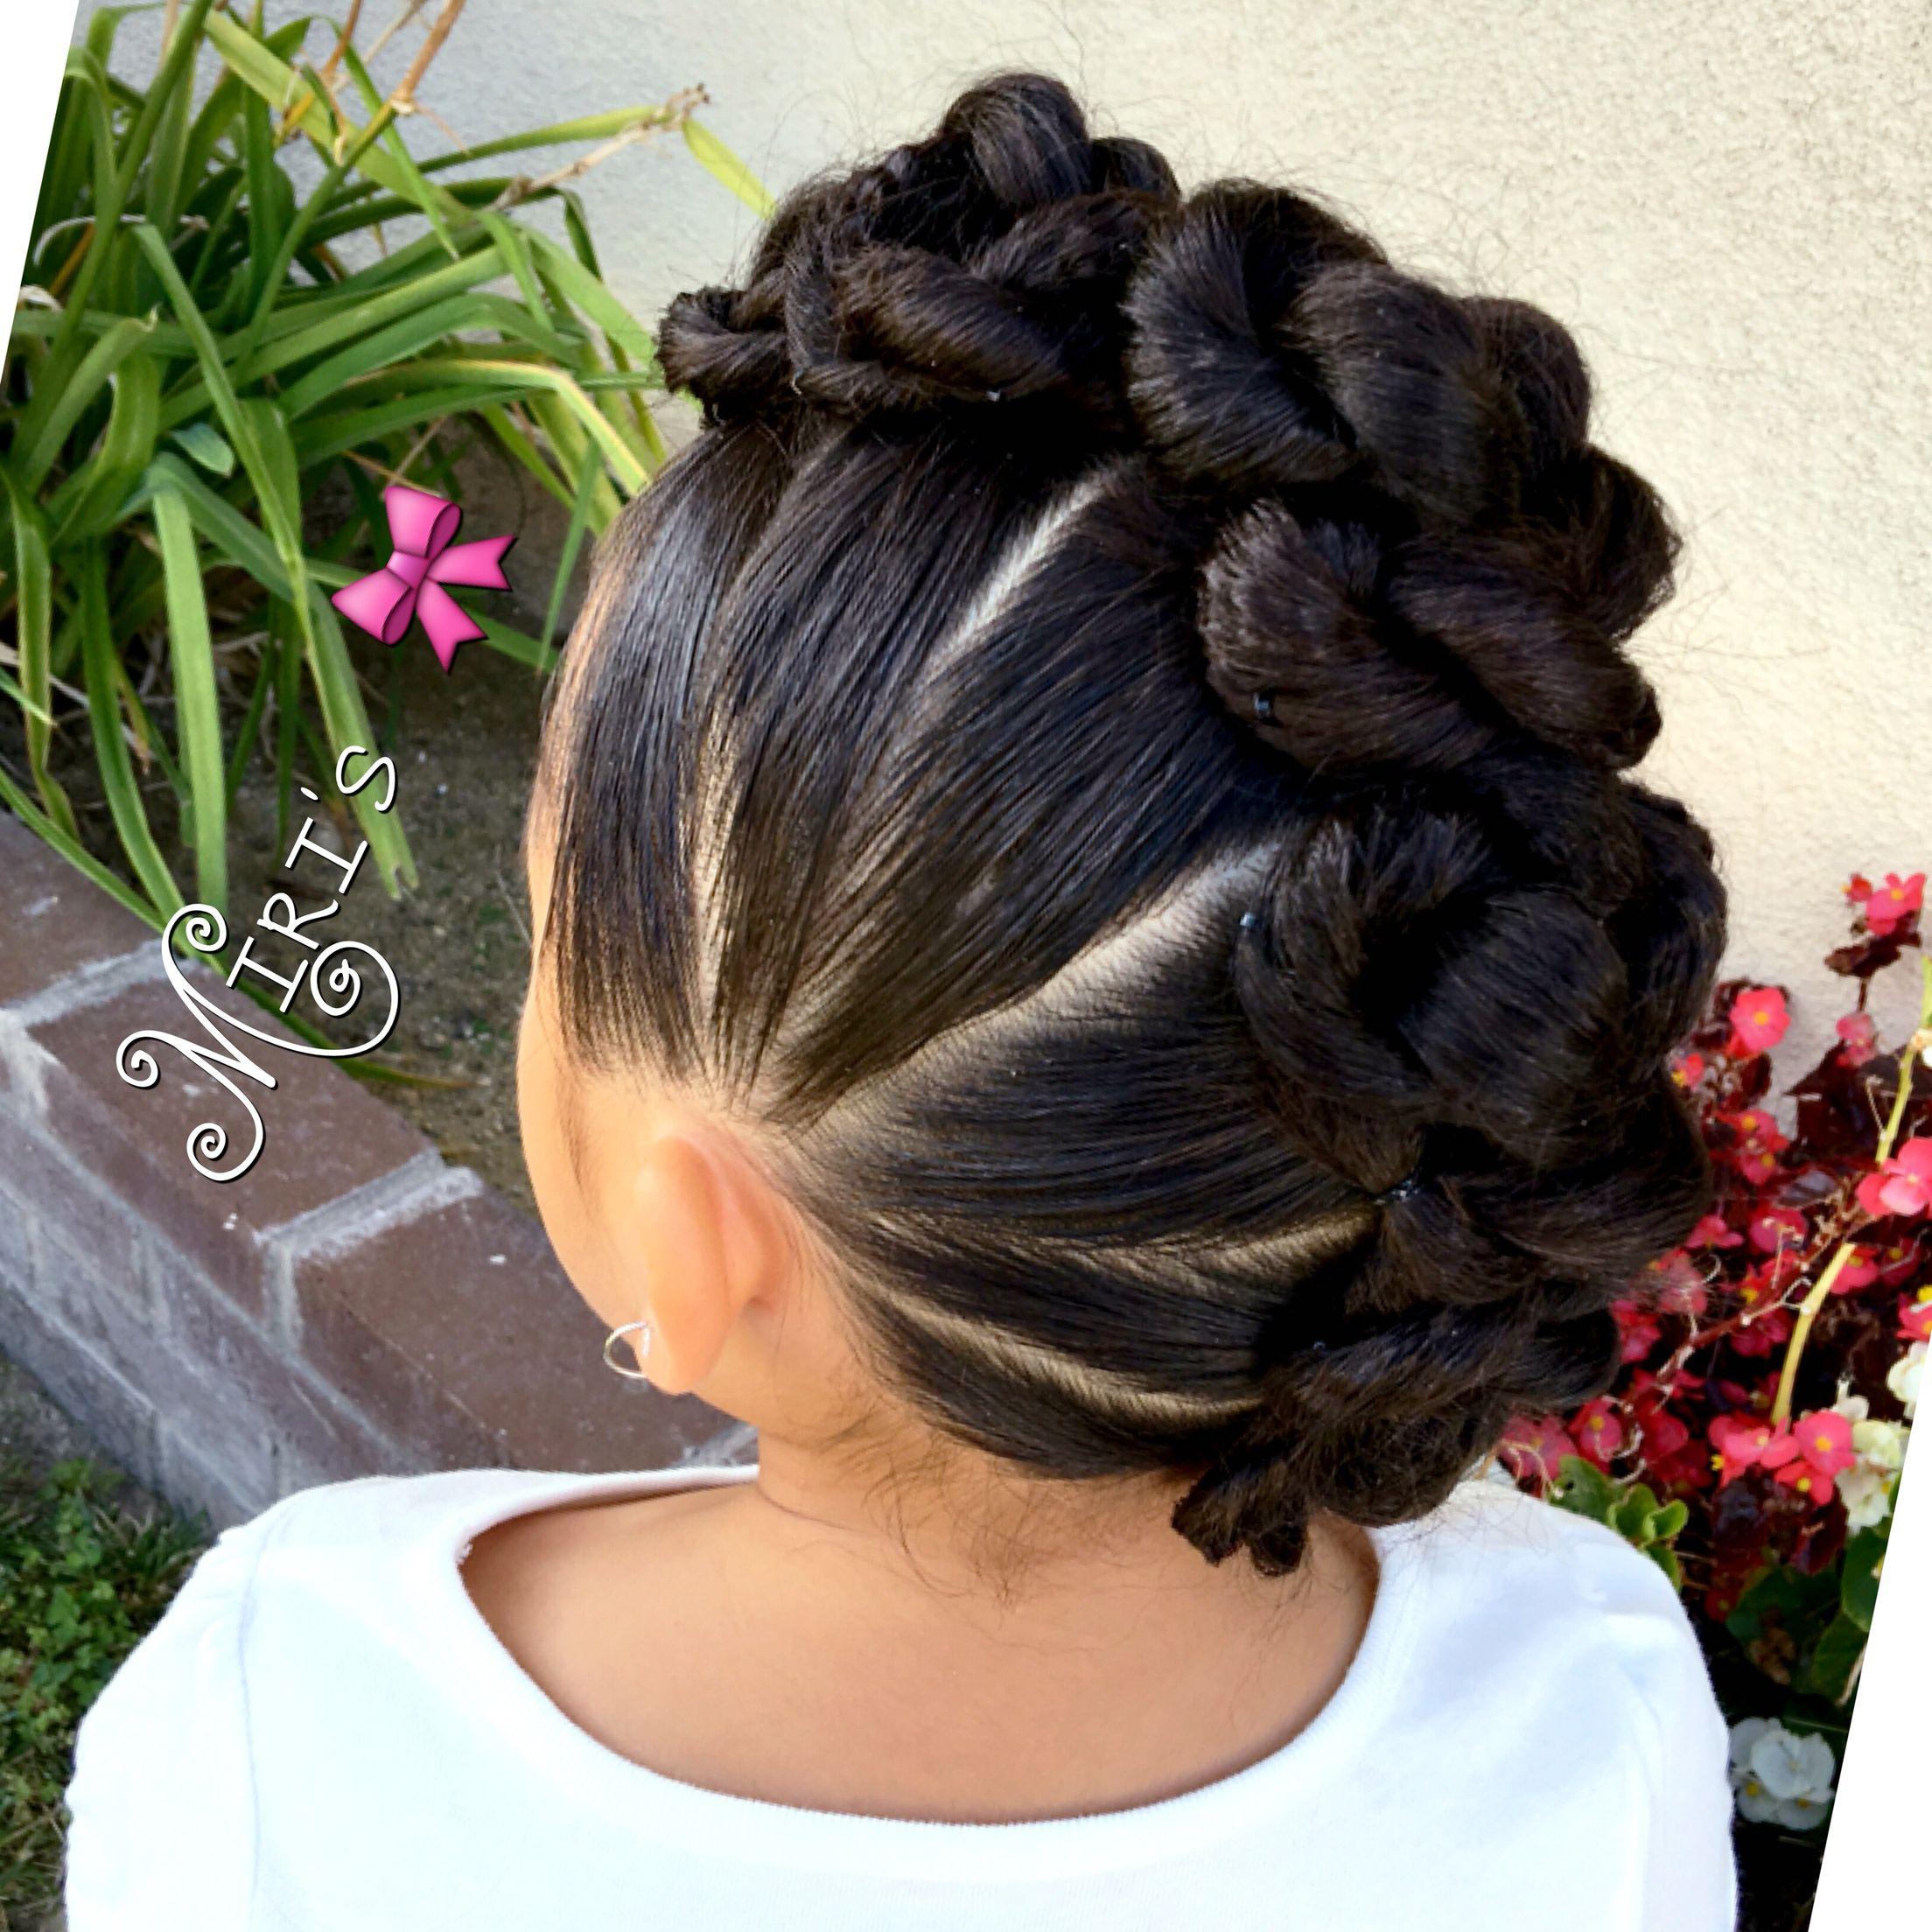 mohawk hair style for little girls | my girls stay cute